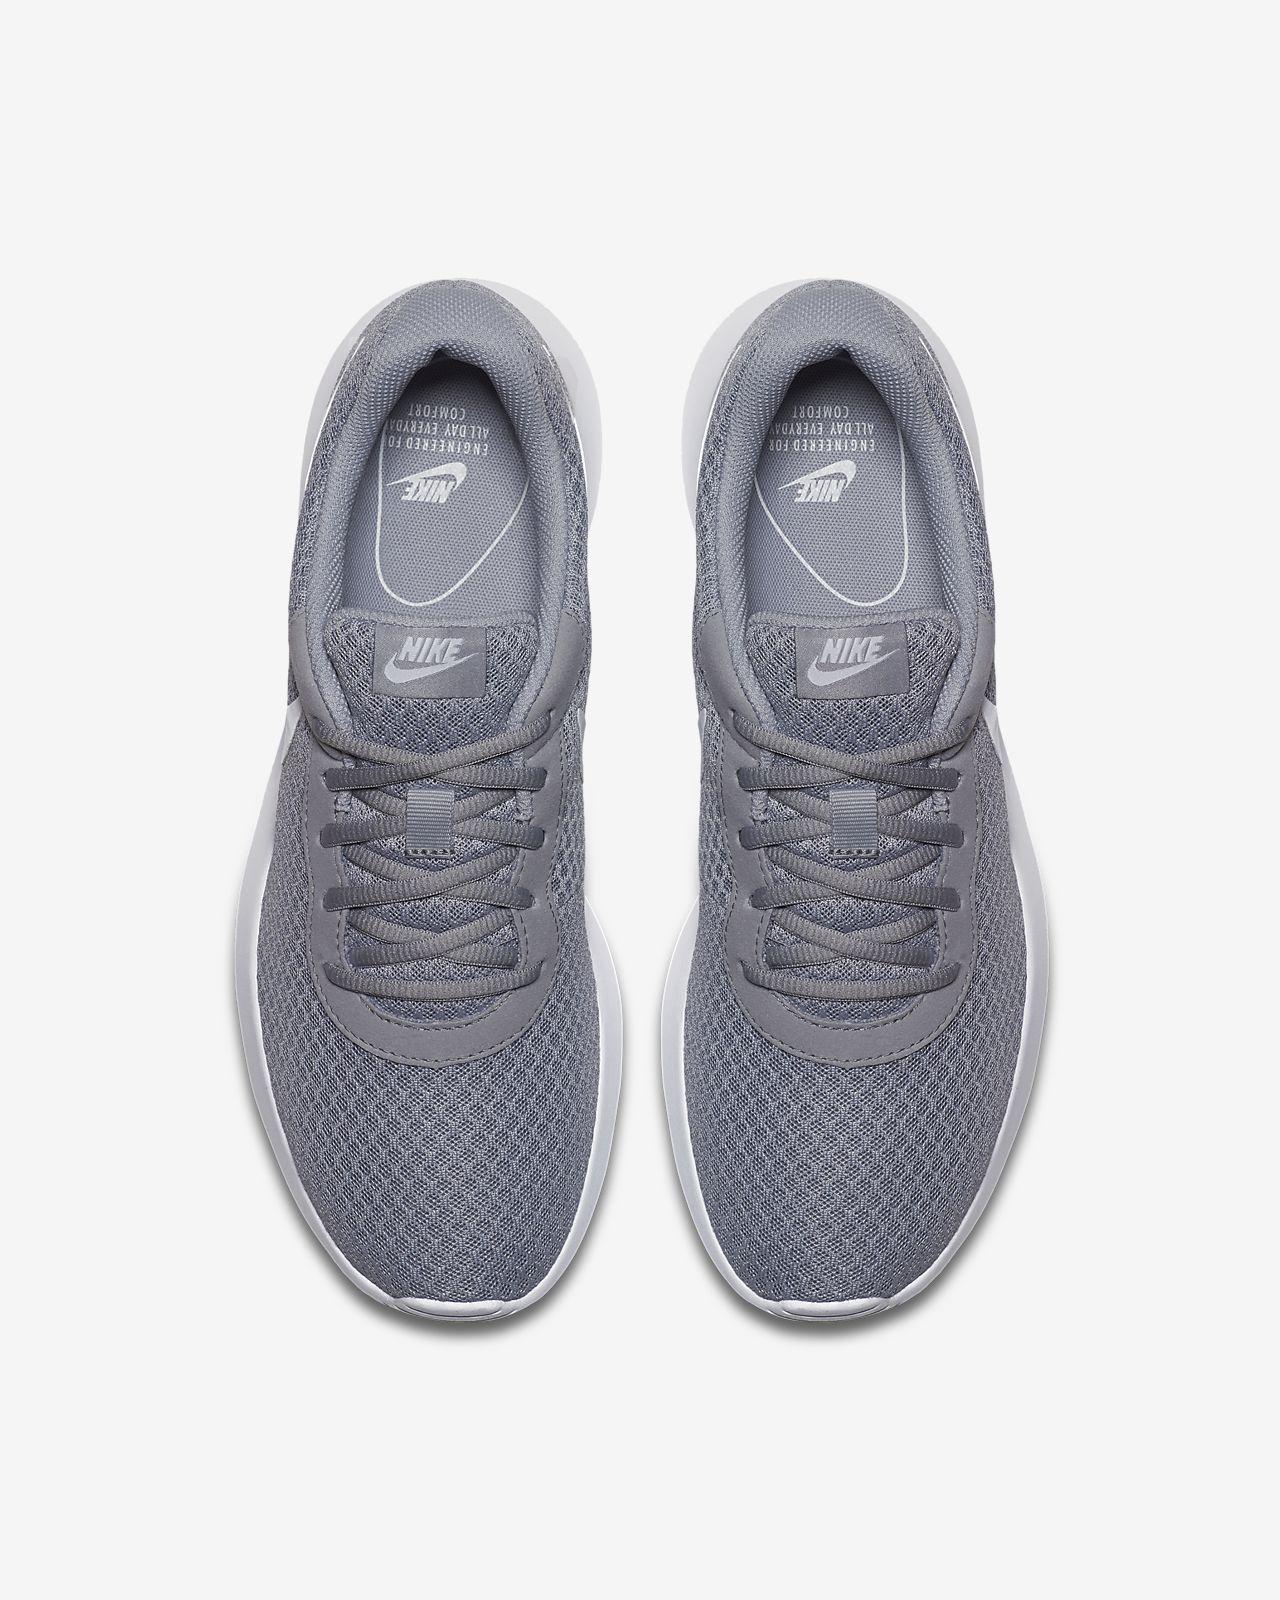 cf662bbcf11a7 Low Resolution Nike Tanjun Men's Shoe Nike Tanjun Men's Shoe